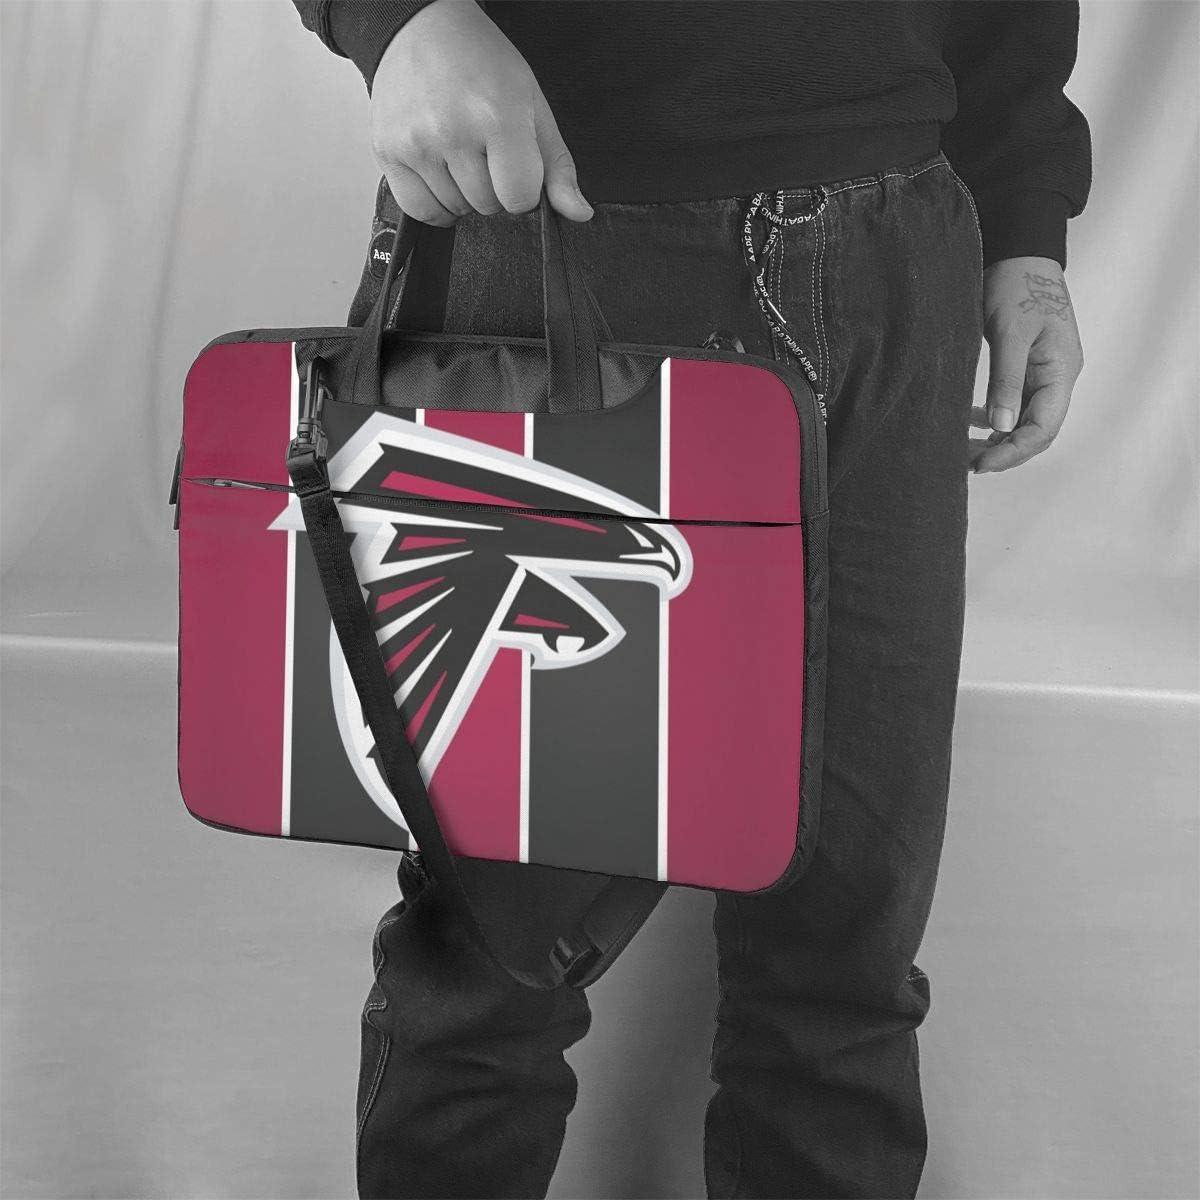 ALHOKLAus Atlanta Falcons Stylish Customized Laptop Bag, Portable Shoulder Bag, Crossbody Bag and Briefcase (3 Sizes)